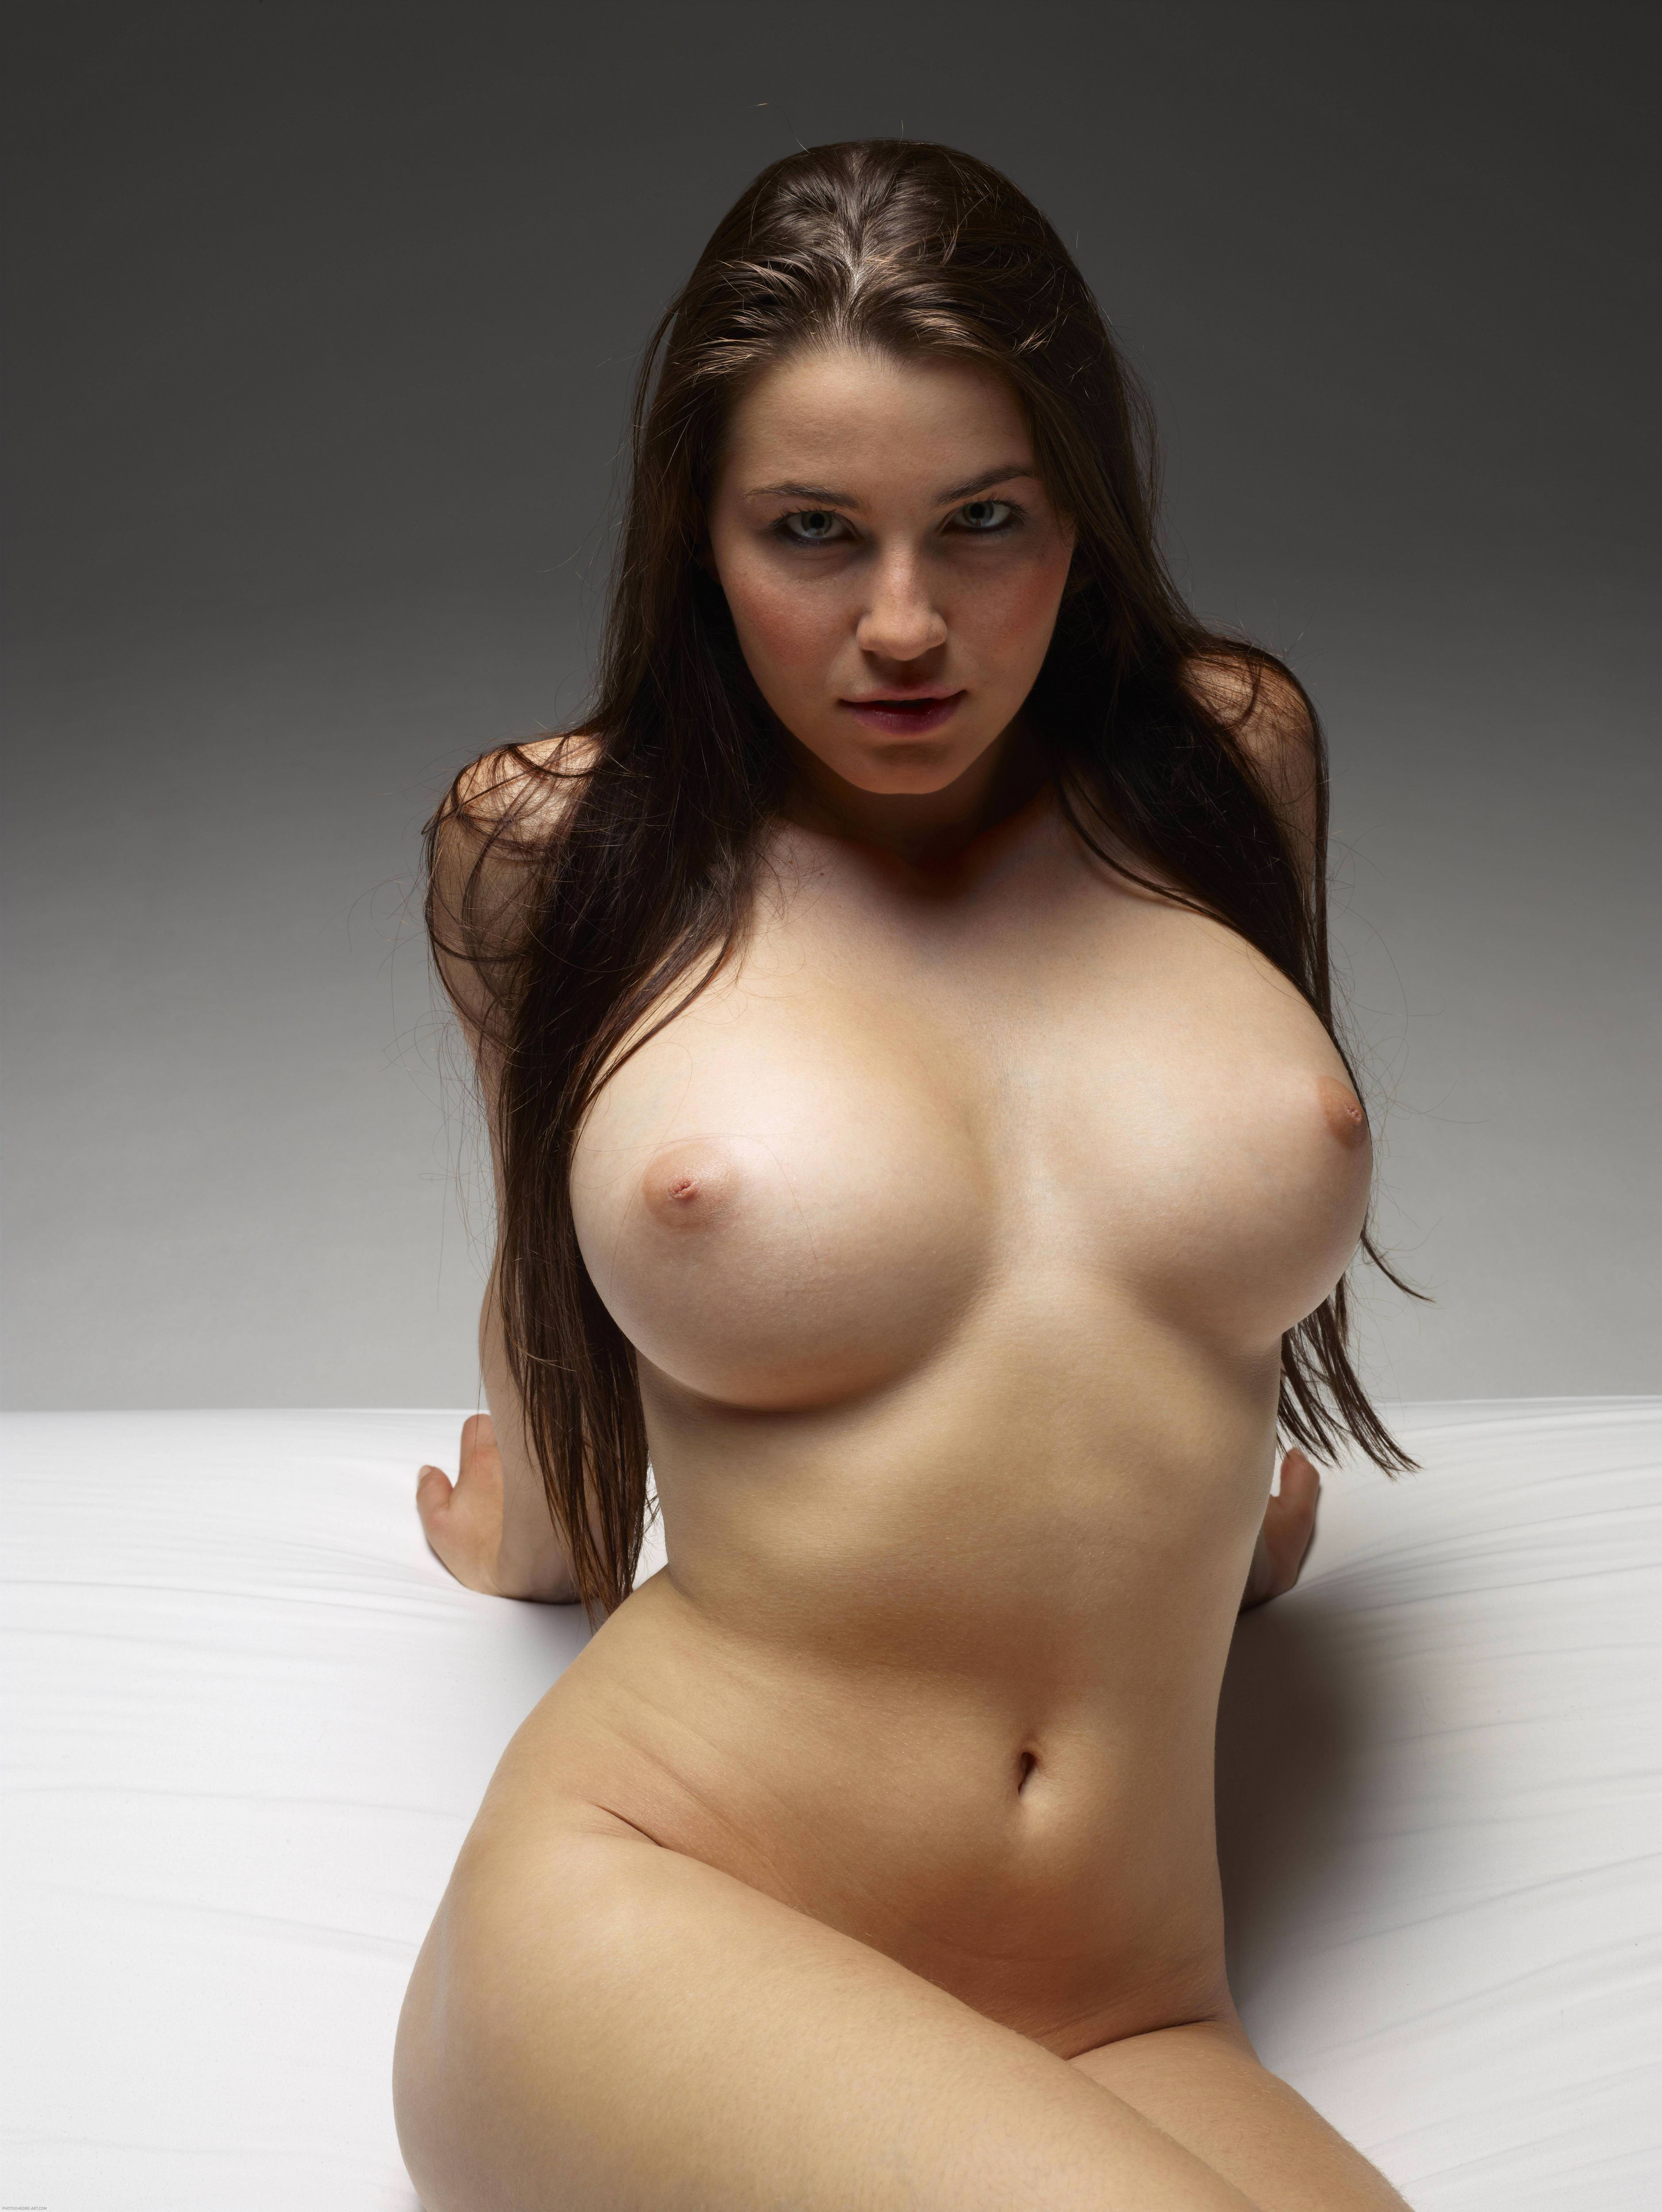 The perfect boob pic